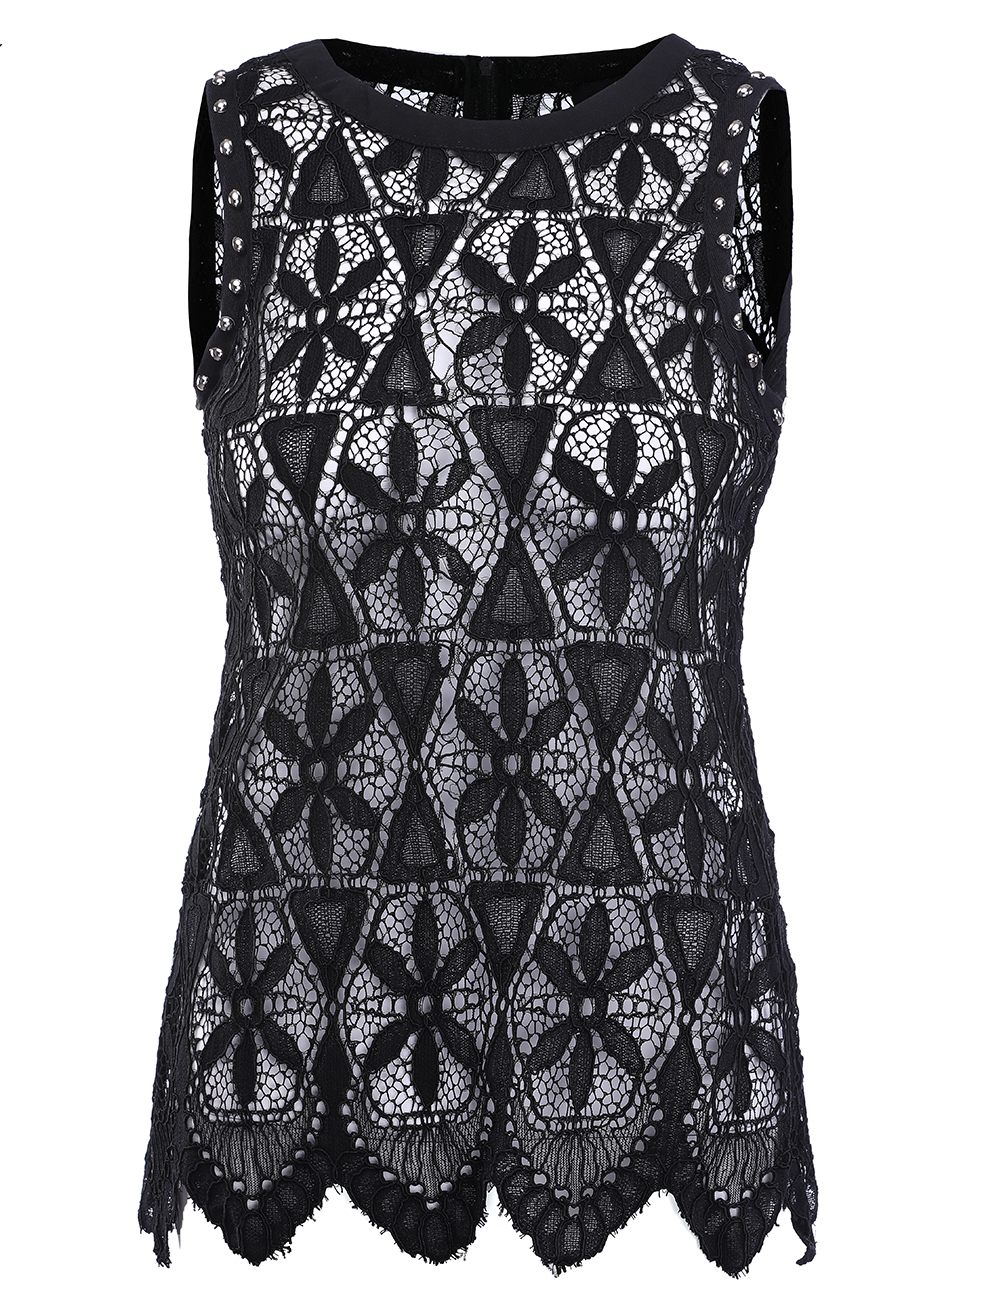 Women Blouse Shirt Femininas 2018 Summer Fashion Woman Lace Elegant Sleeveless Blusas Crochet Casual Shirts Tops Plus Size